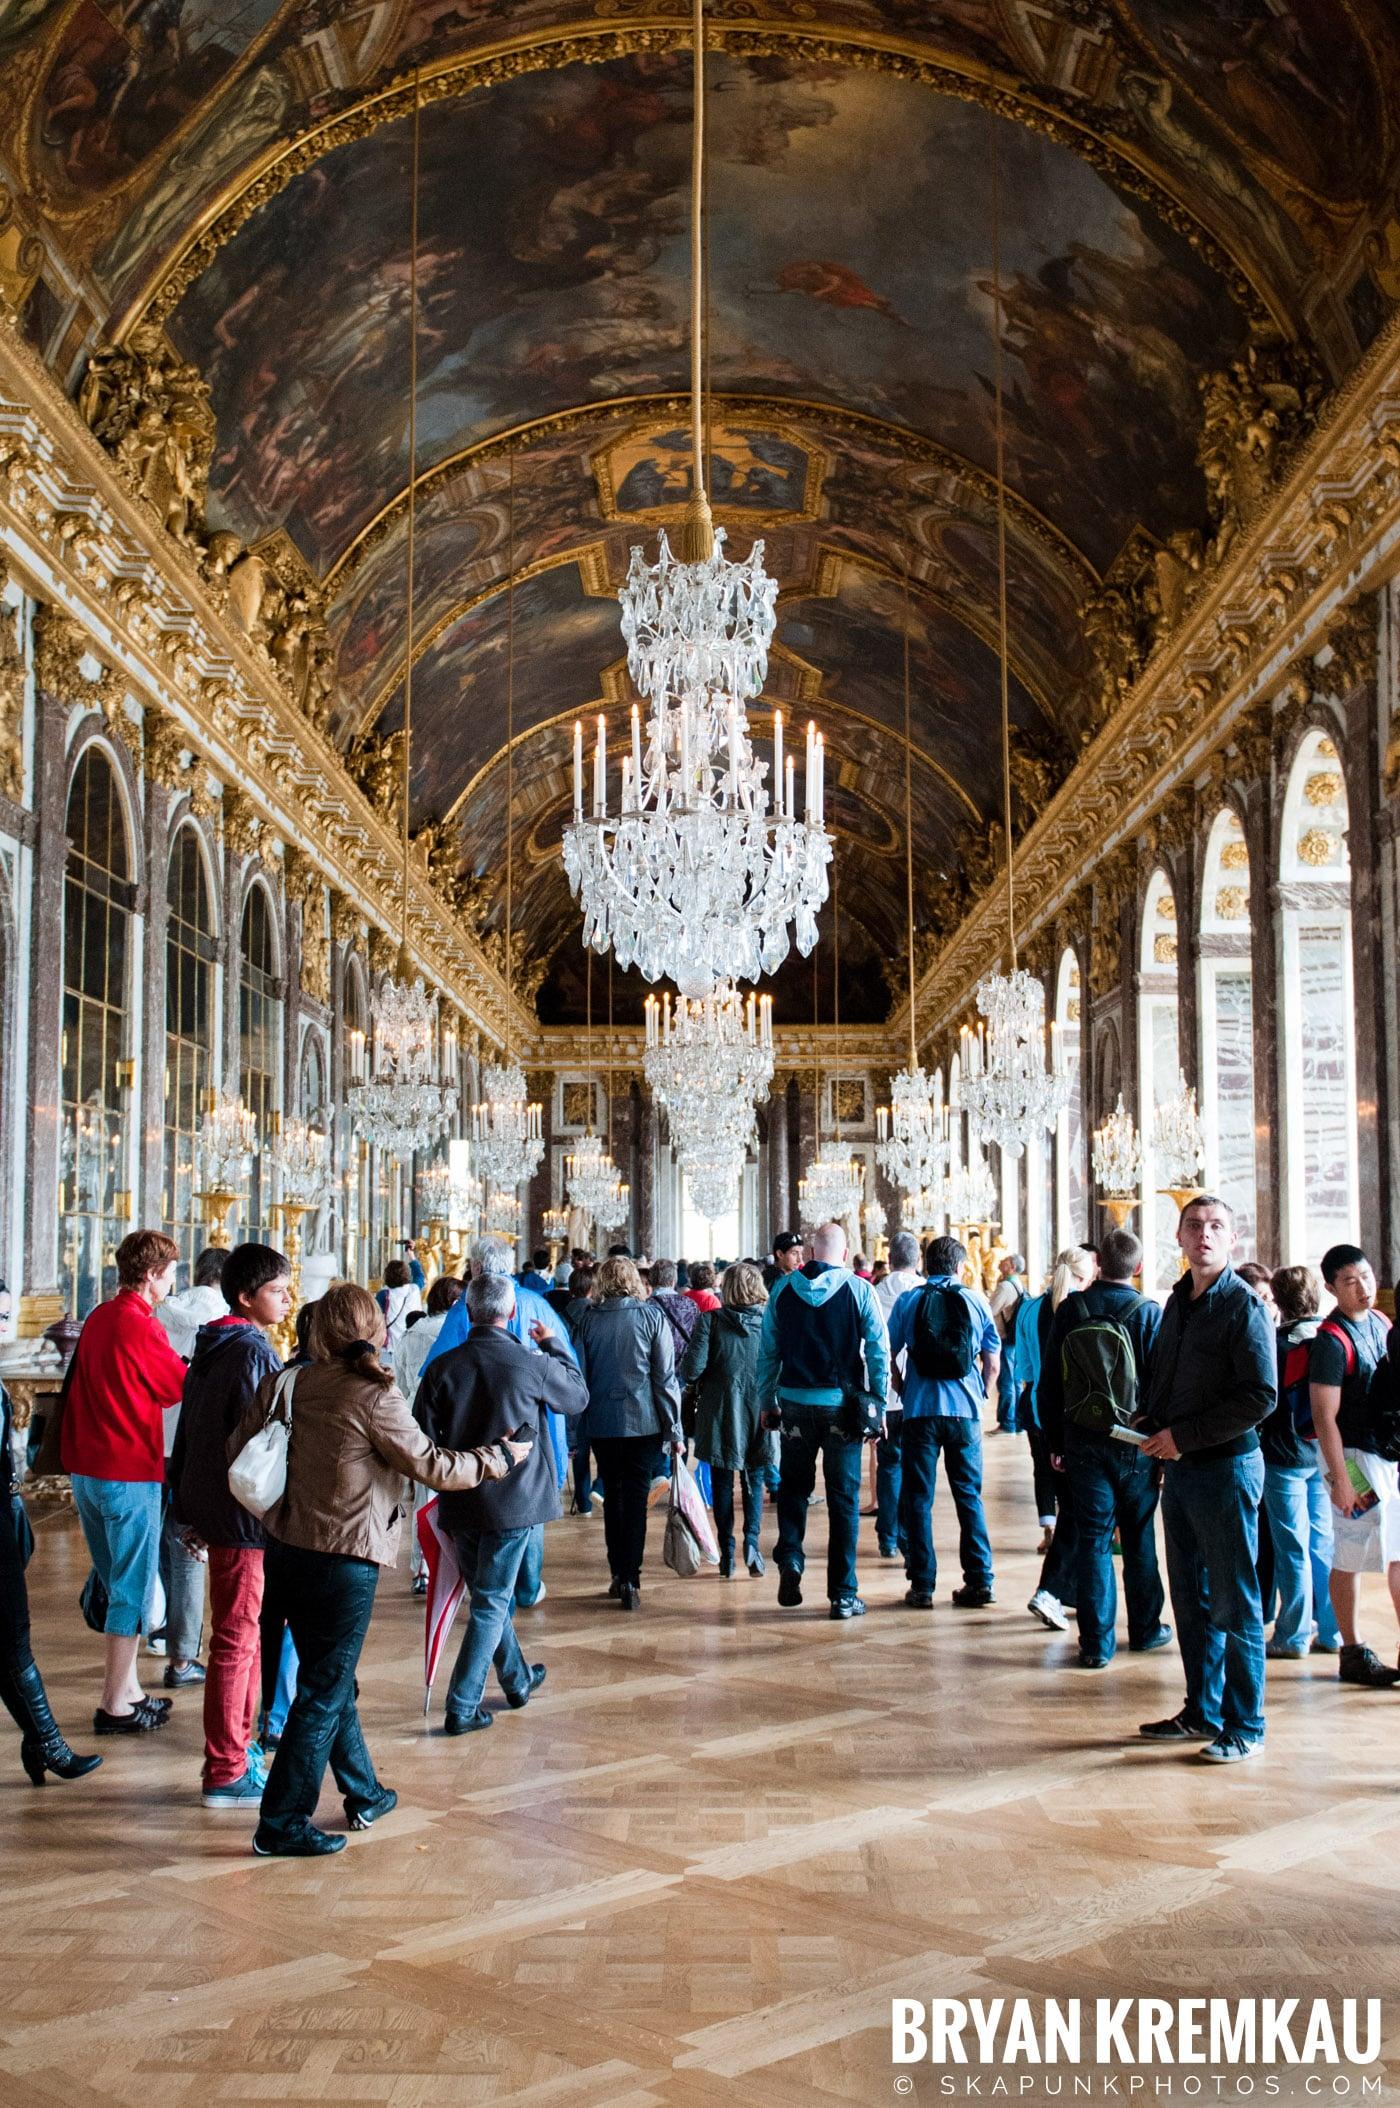 Paris, France Honeymoon - Day 2 - 7.19.11 (28)